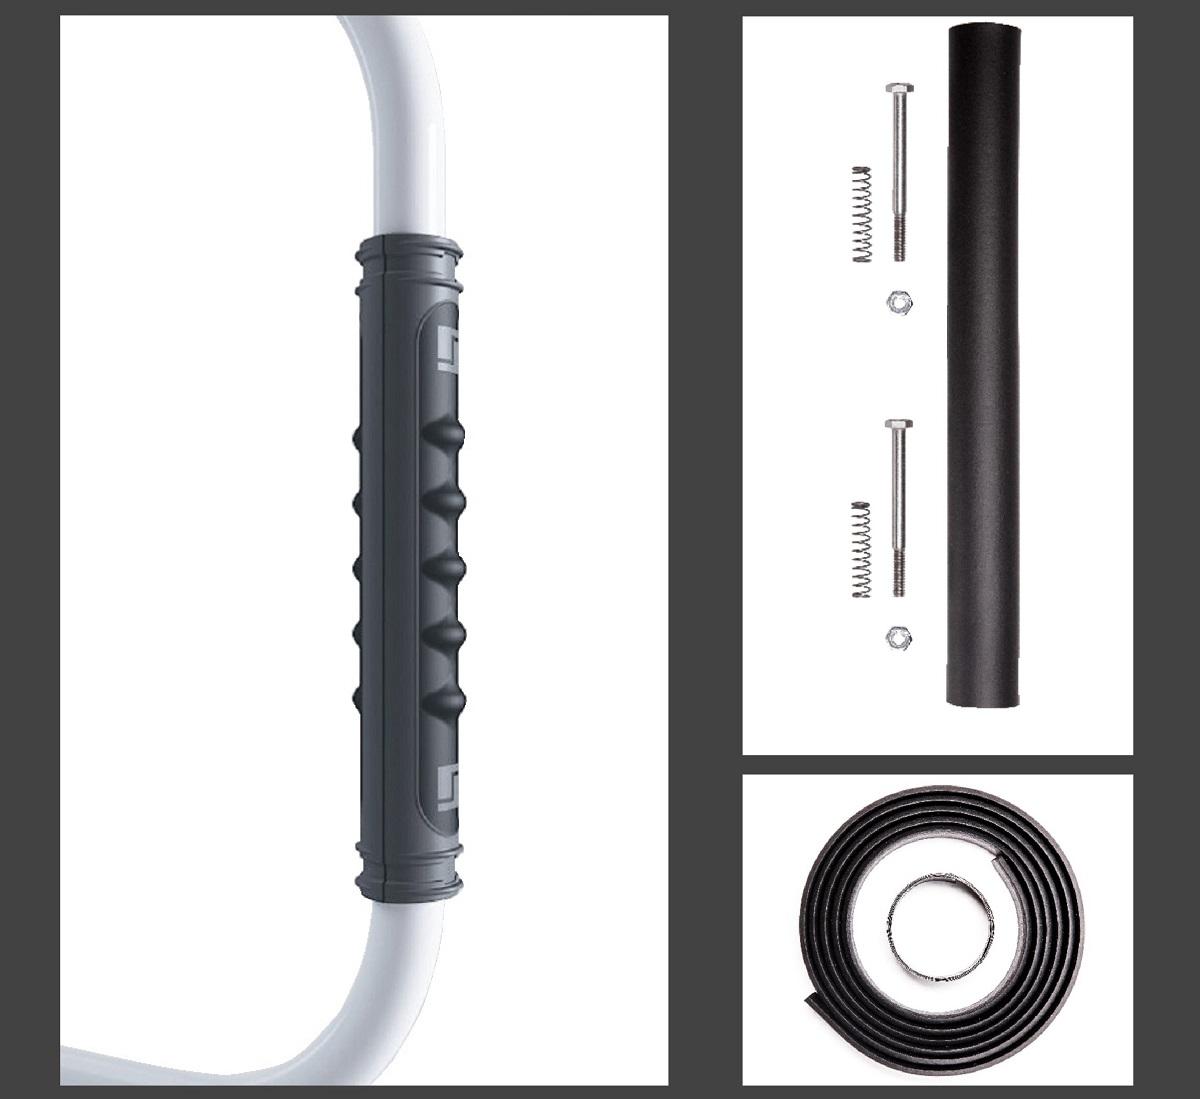 baeac44627bd Replacement Hand Rail Grips